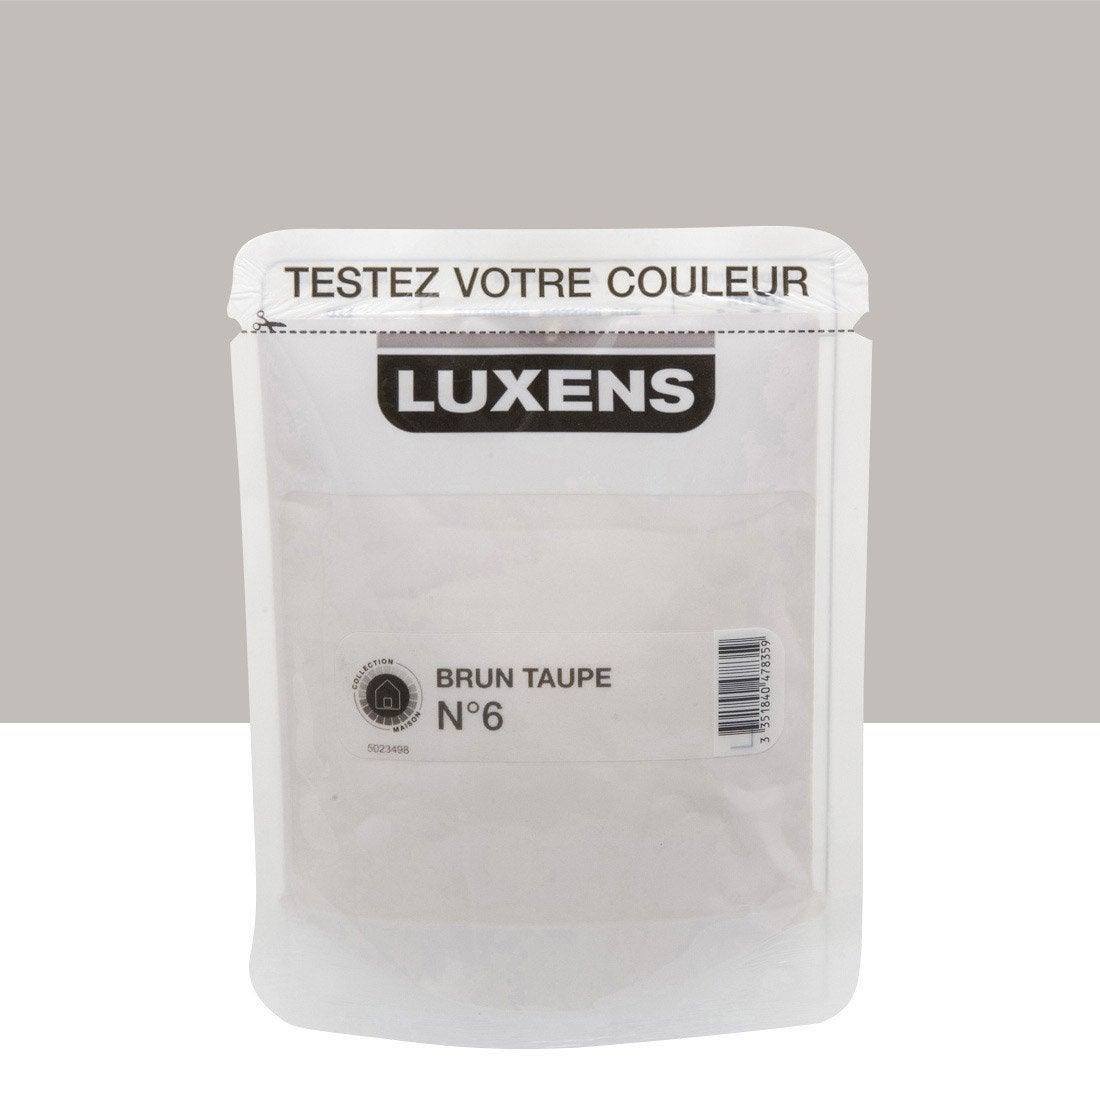 Testeur peinture brun taupe 6 luxens couleurs int rieures satin l leroy merlin for Peinture brun taupe